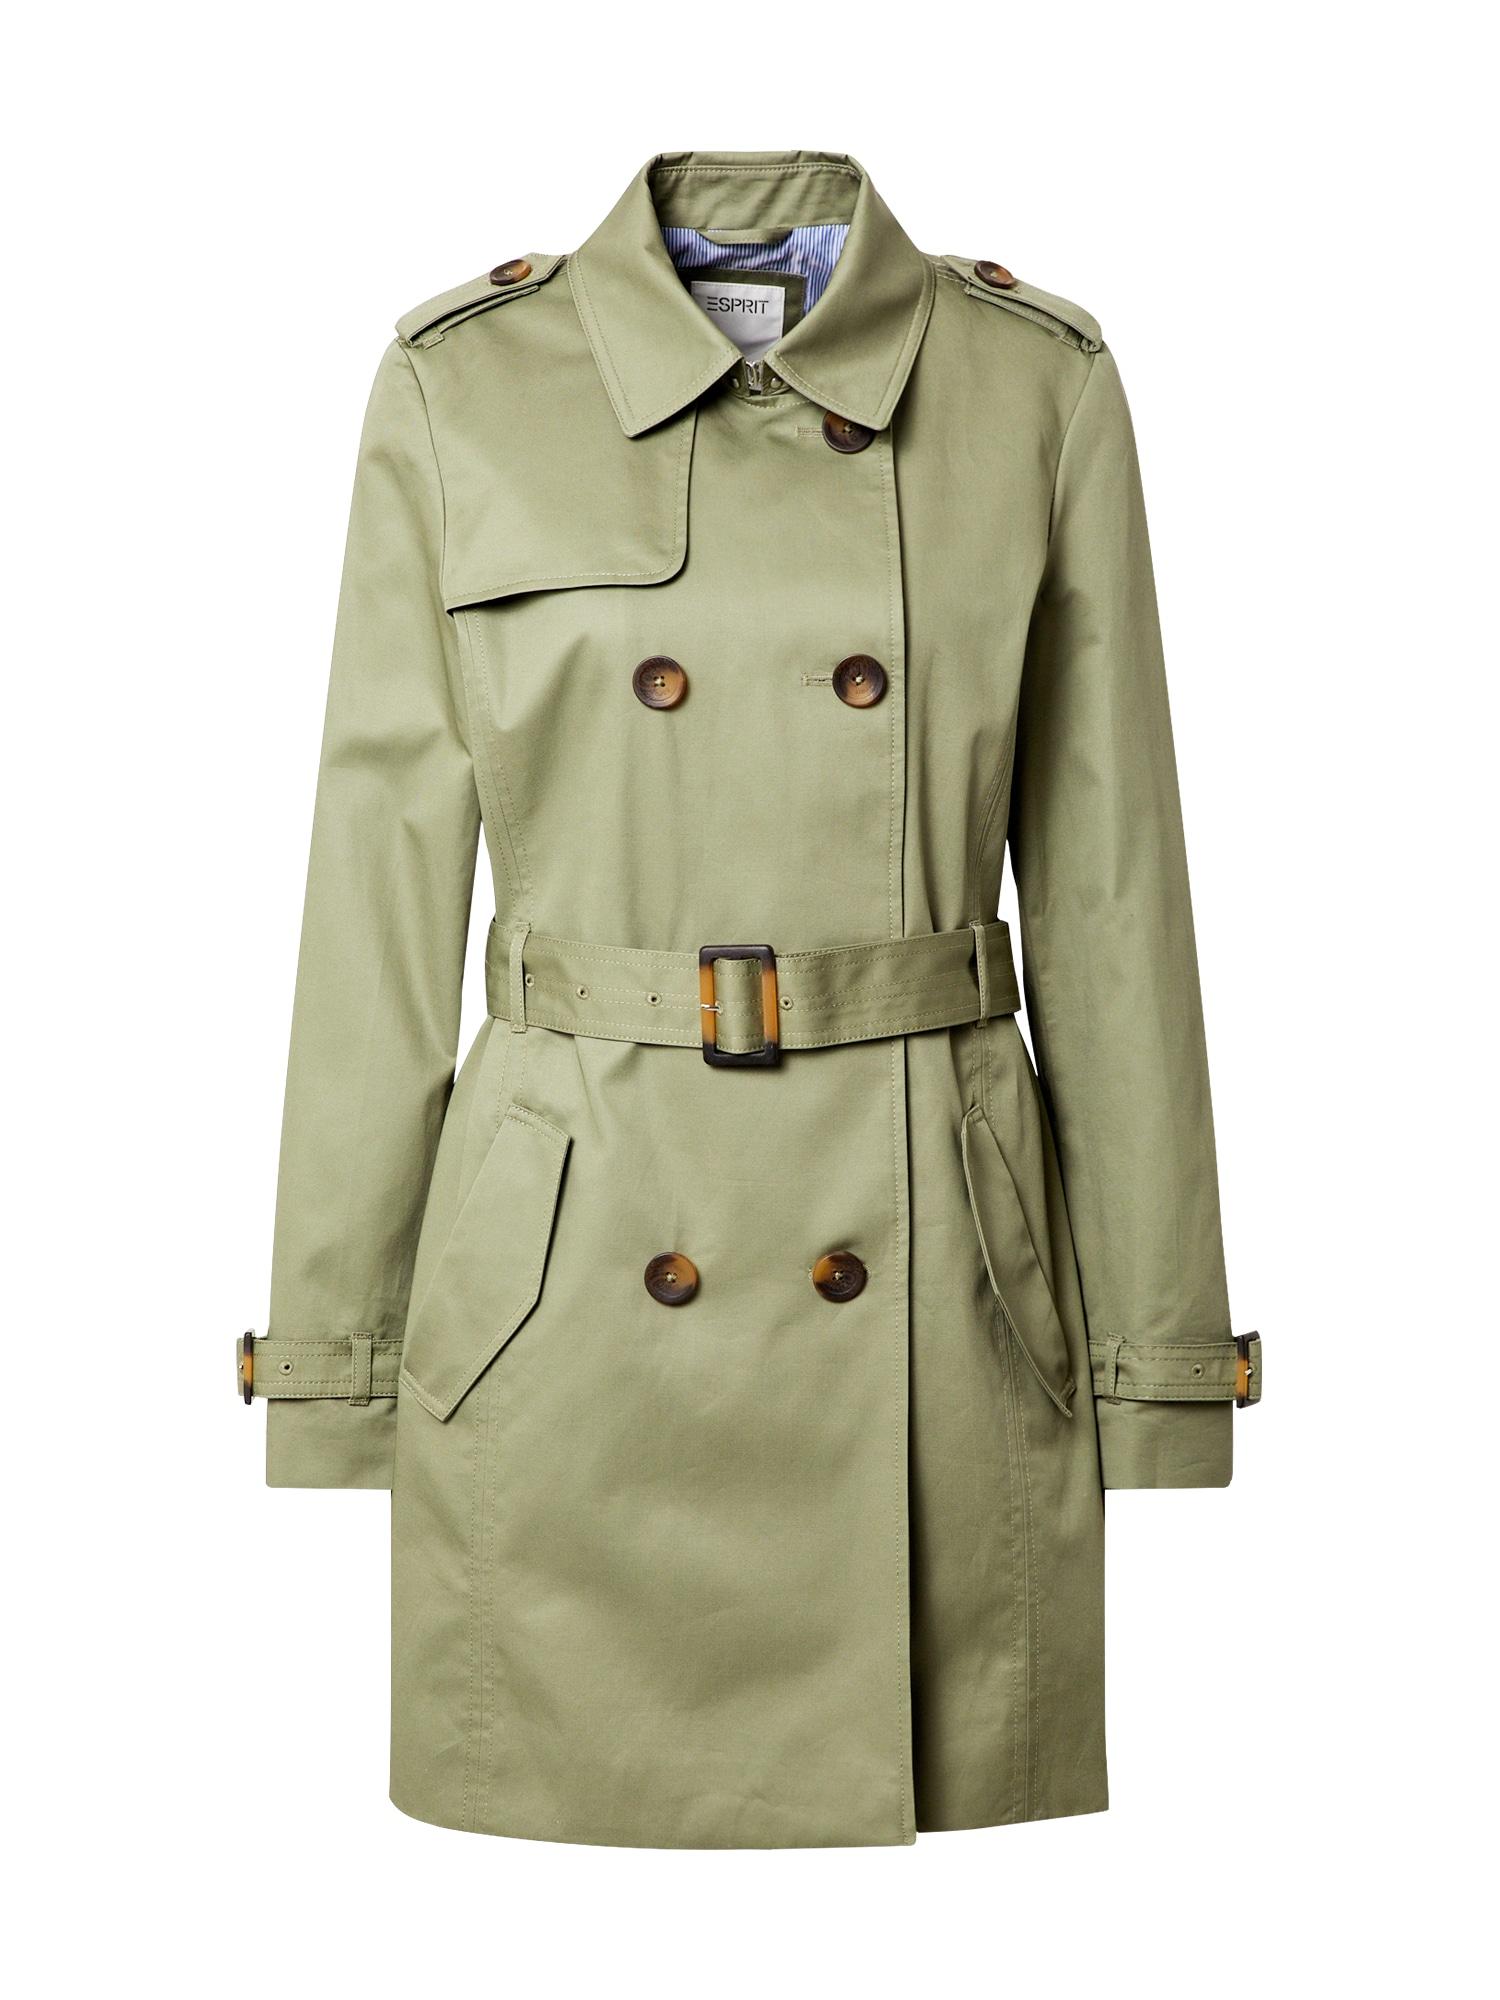 ESPRIT Demisezoninis paltas rusvai žalia